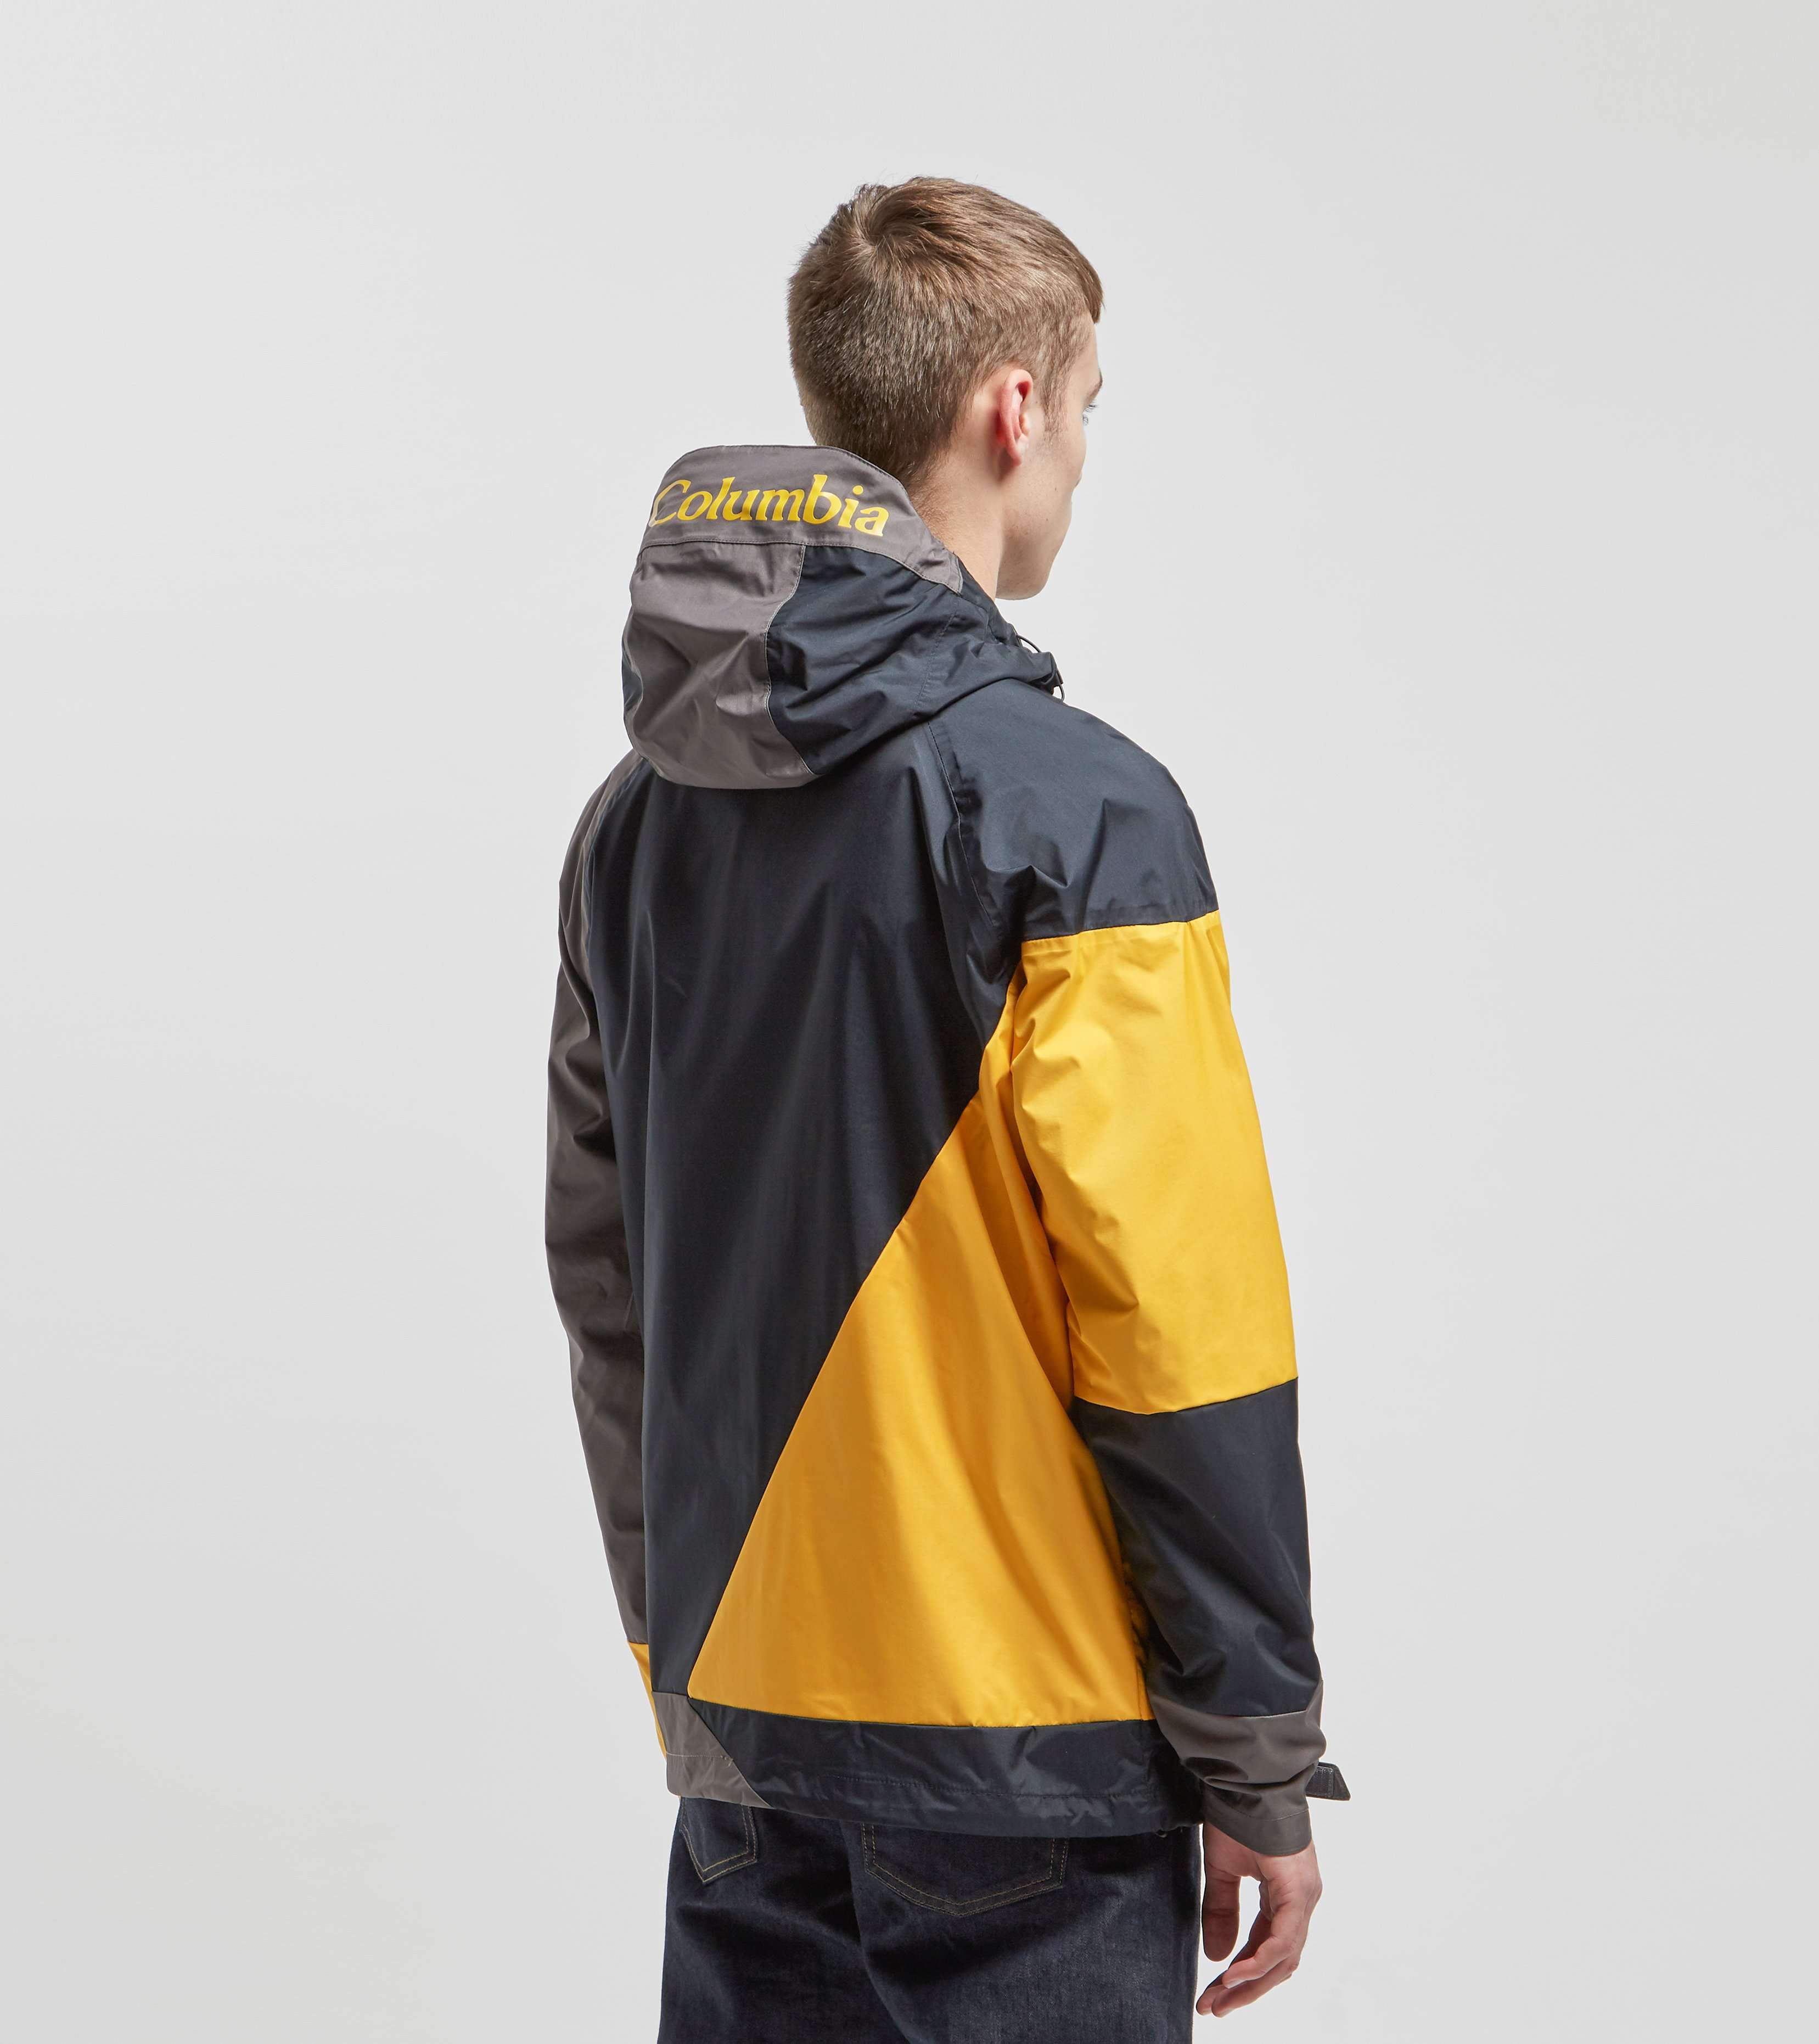 Columbia Windell Park Jacket - size? Exclusive